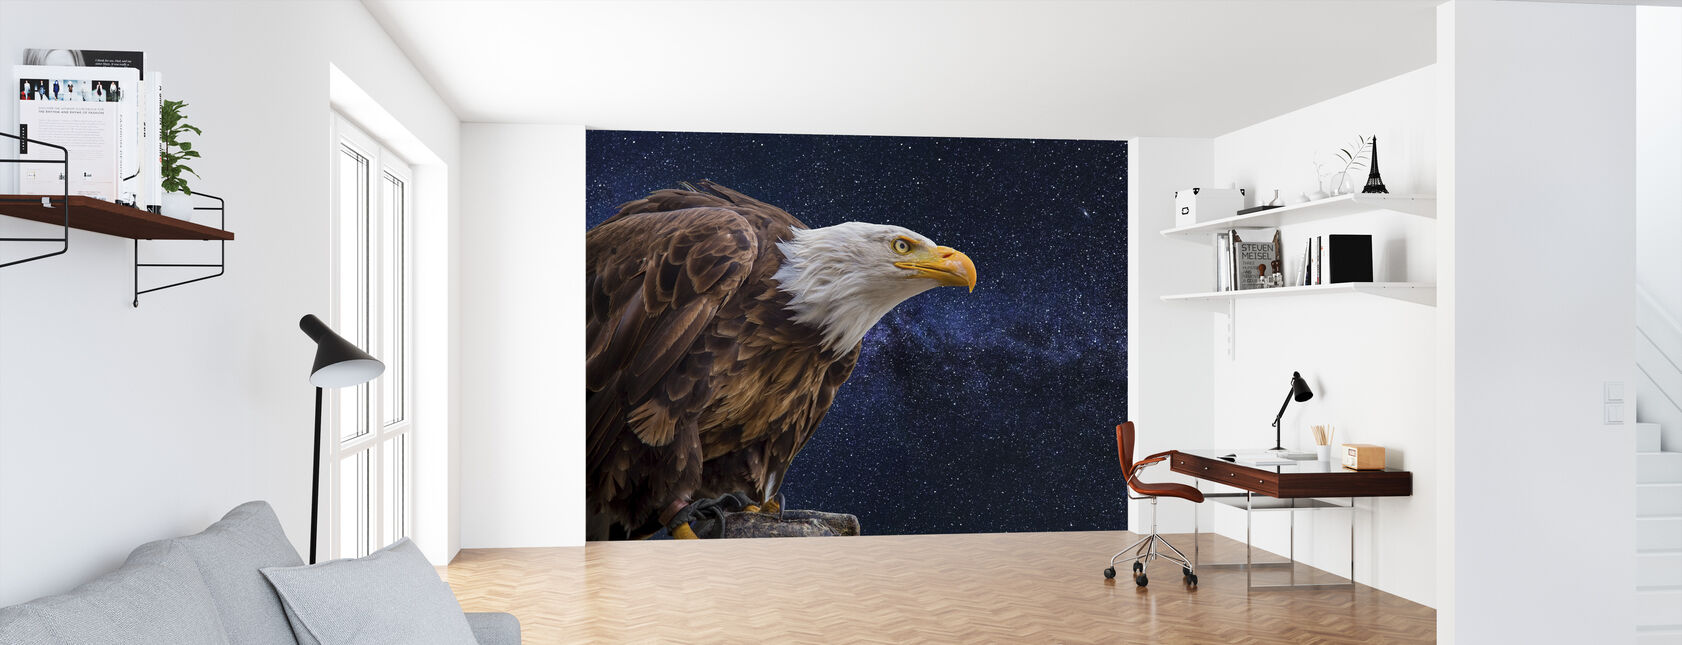 The Bald Eagle - Wallpaper - Office